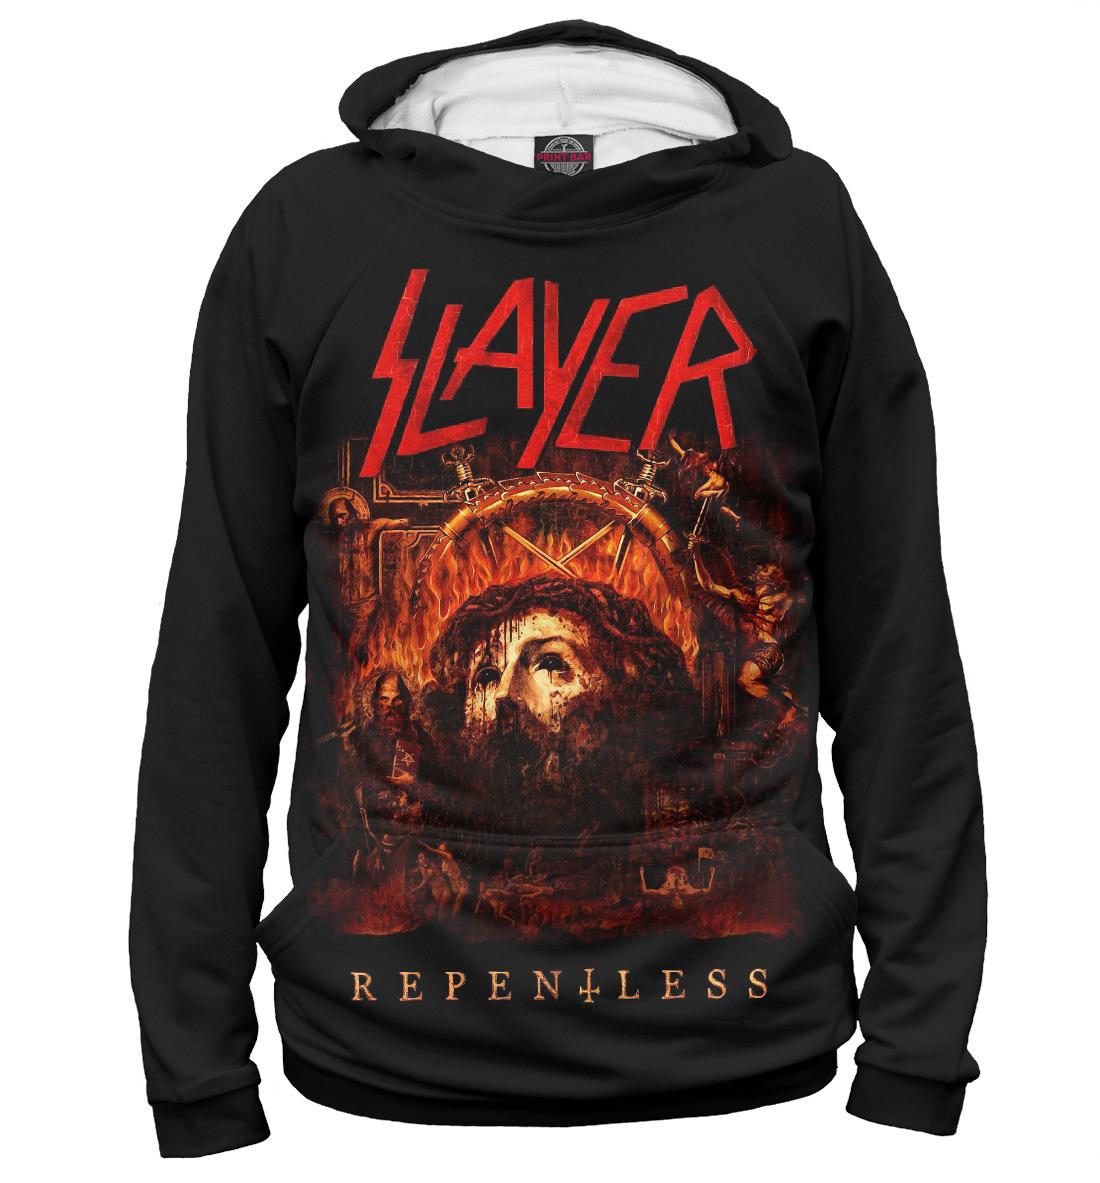 Купить Slayer Repentless, Printbar, Худи, SLR-806518-hud-2